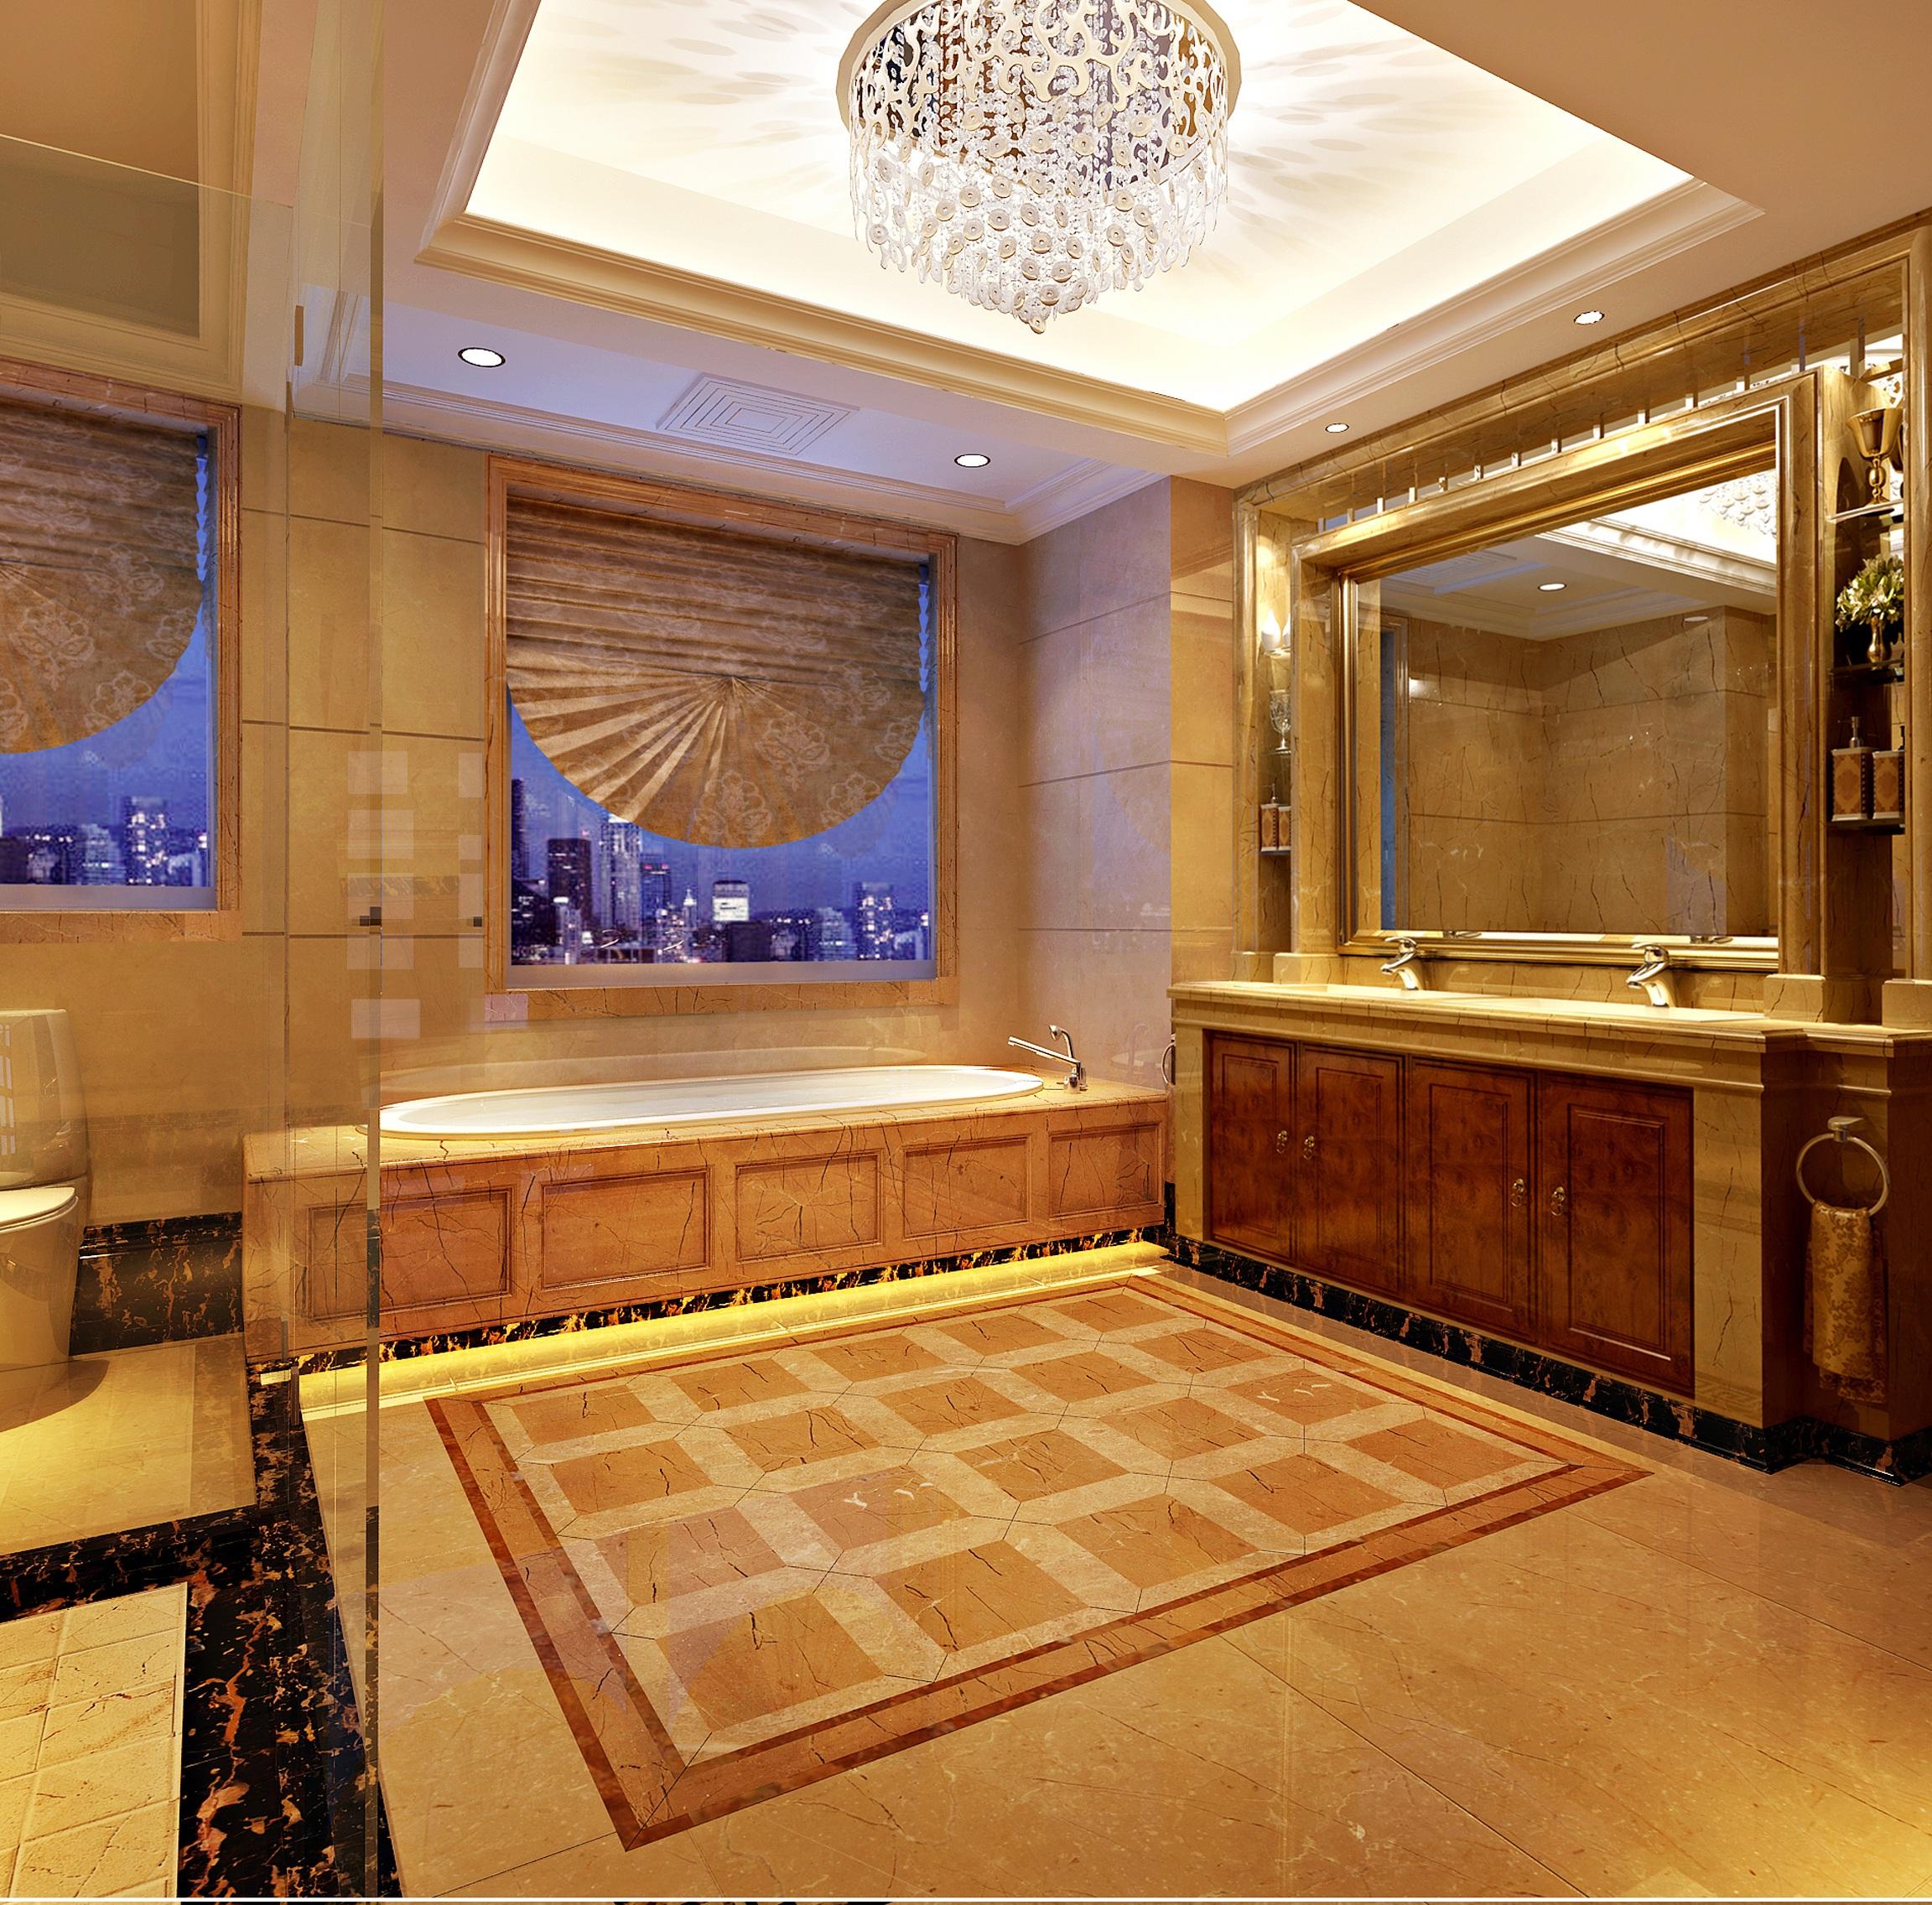 Marble Bathrooms Photos: Free Stock Photo Of Bathroom, Household, Marble